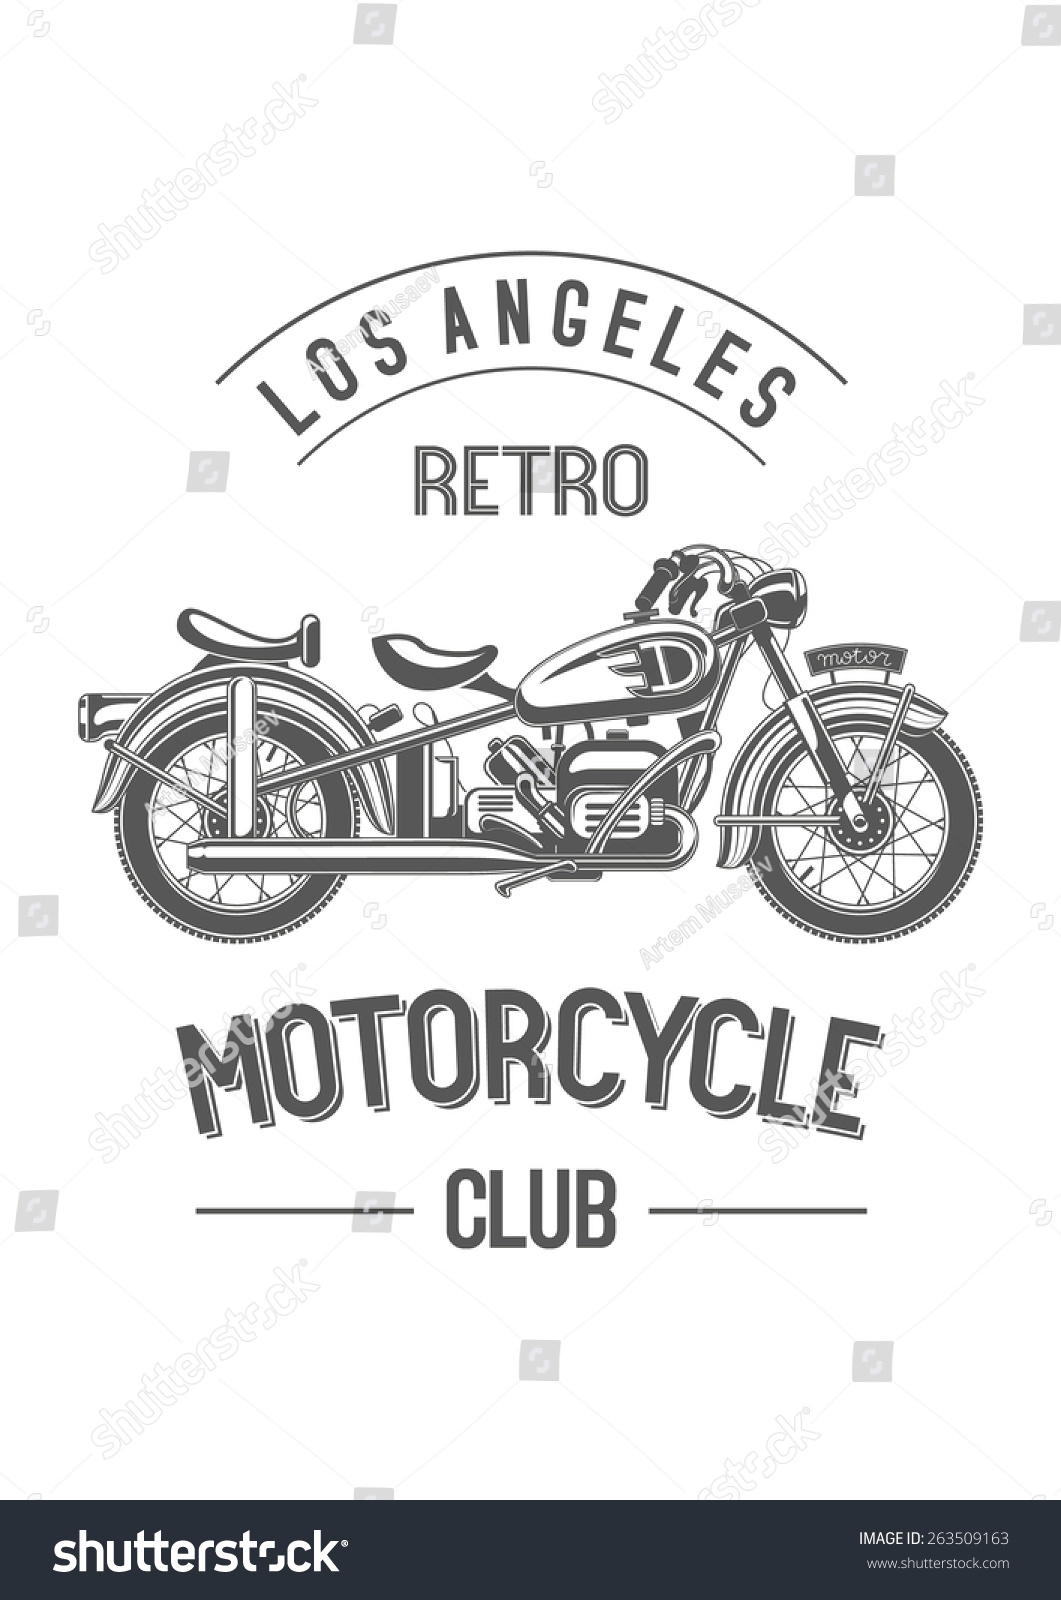 Retro Motorcycle Club Logo Monochrome Black Old Bike Isolated On White Sample City And